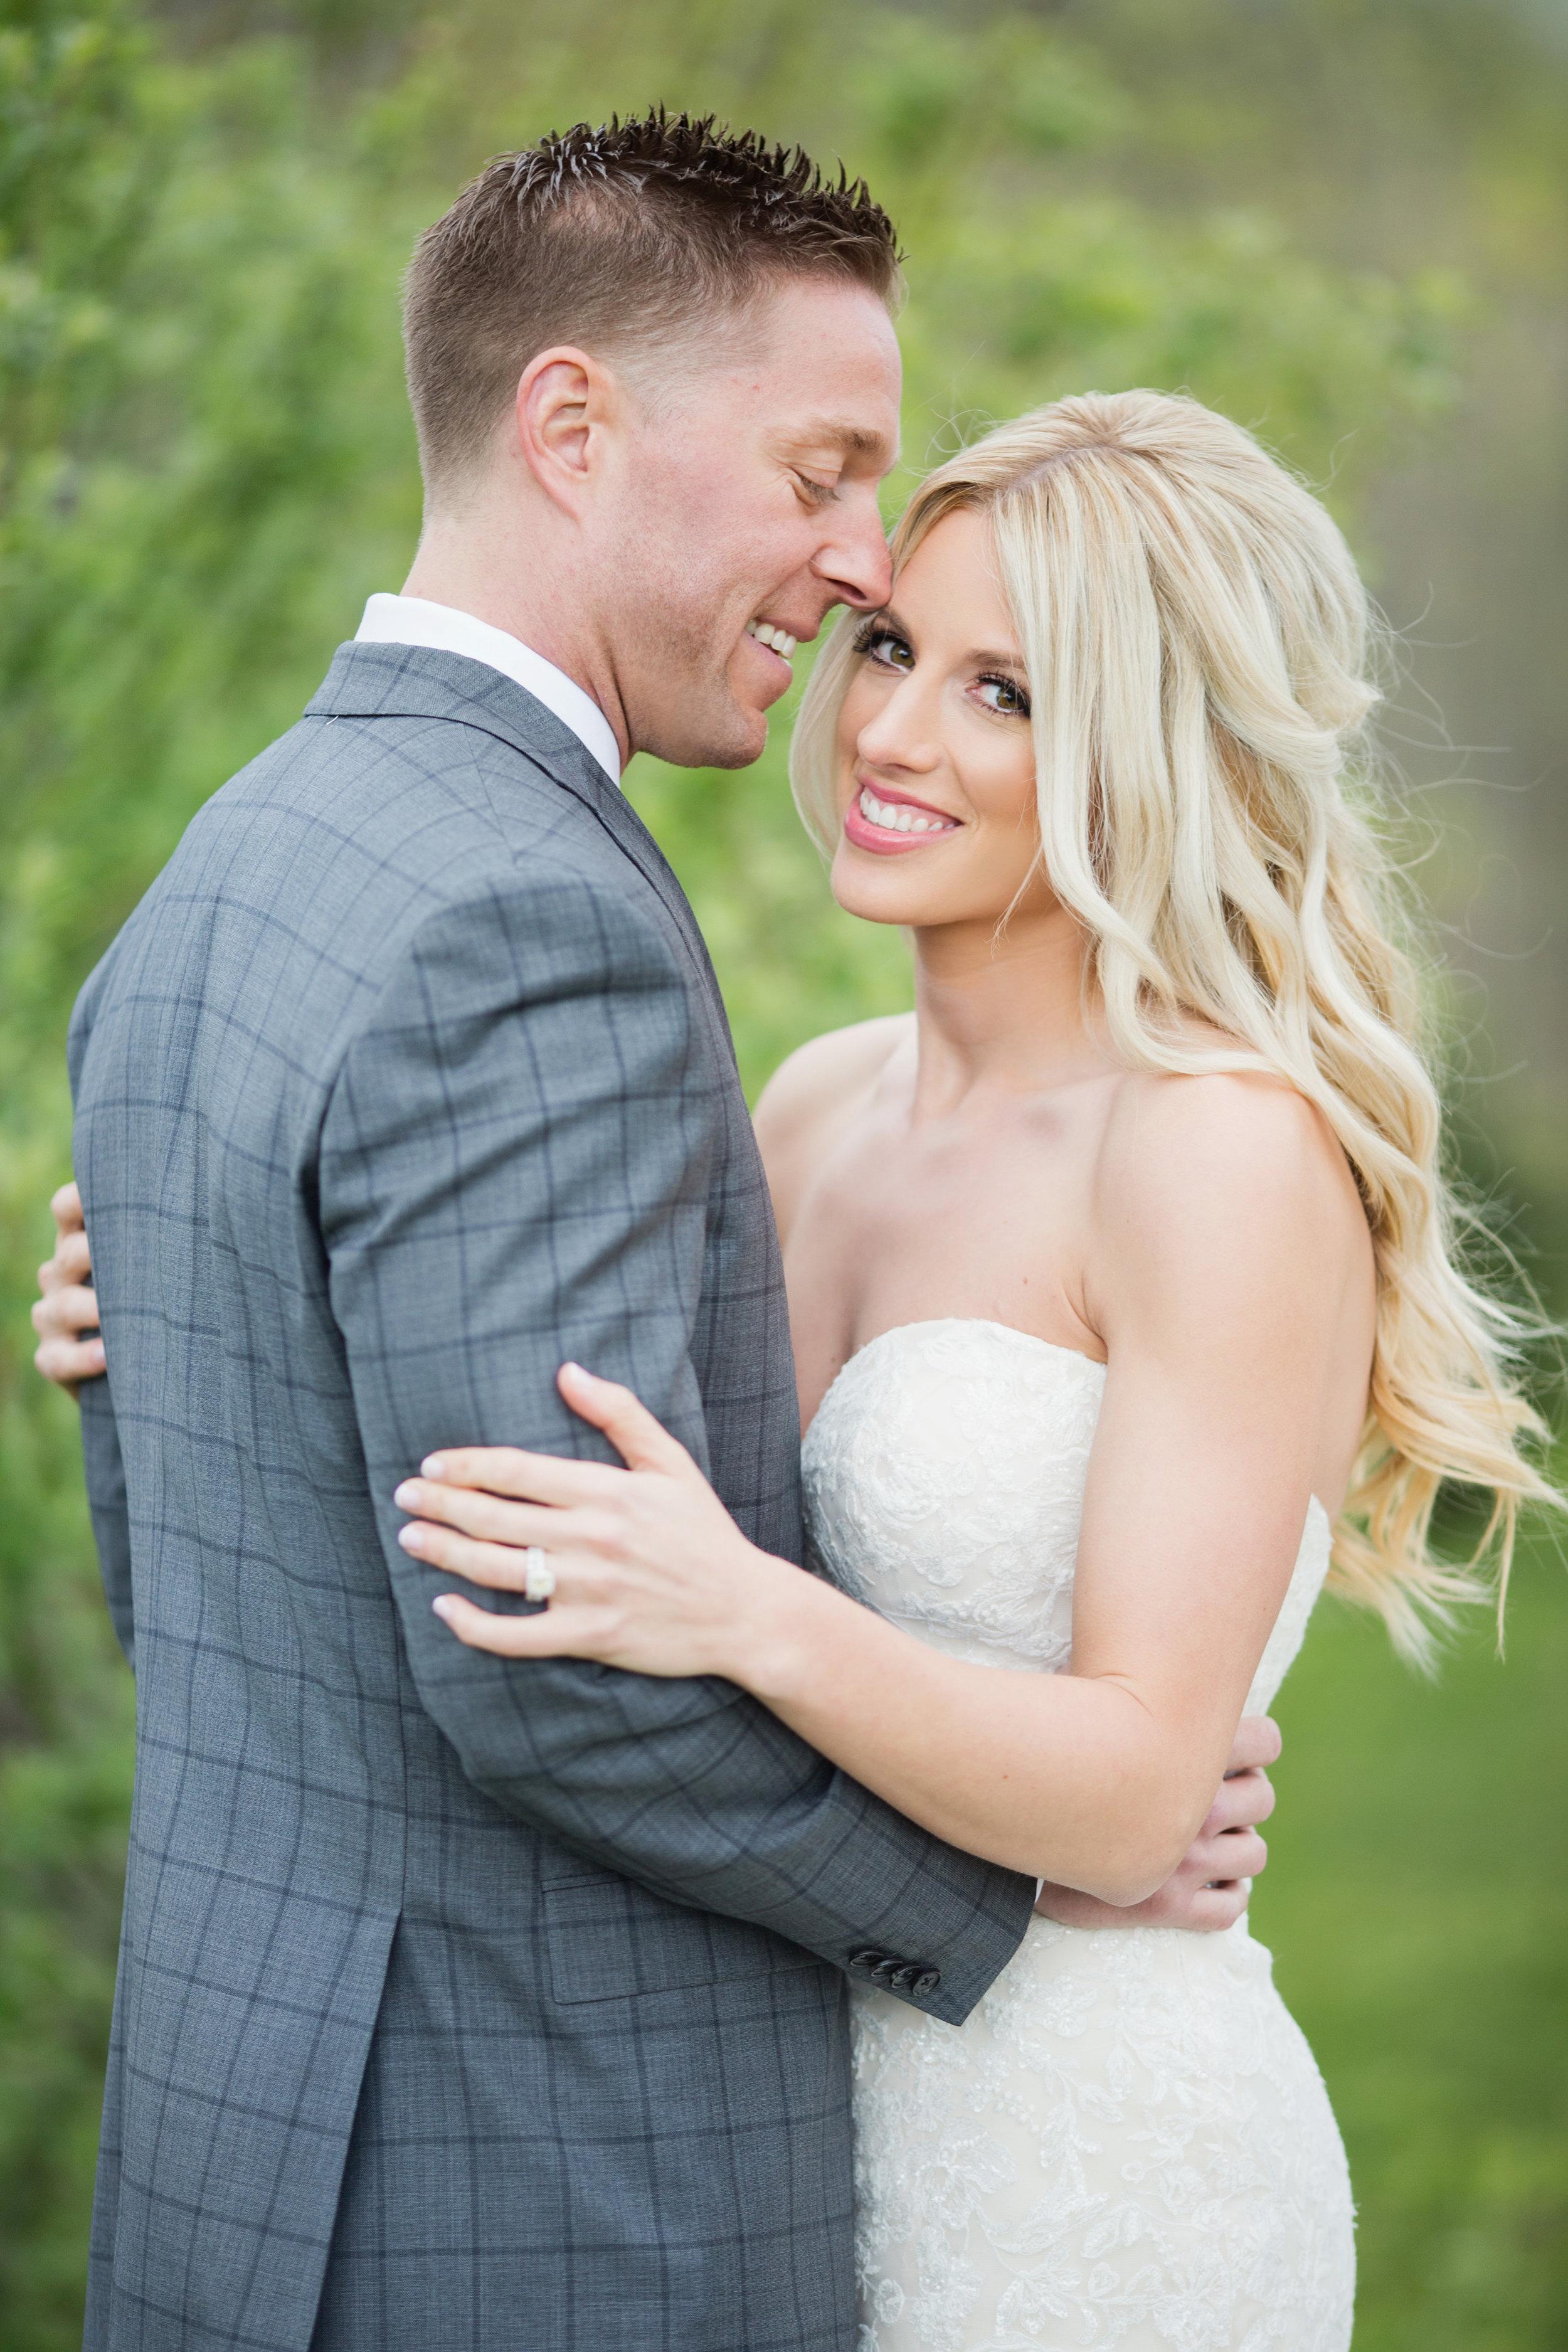 stylish-wedding-photography-windsor-toronto-ontario-wedding-photographer-winery-eryn-shea-photography-10.jpg